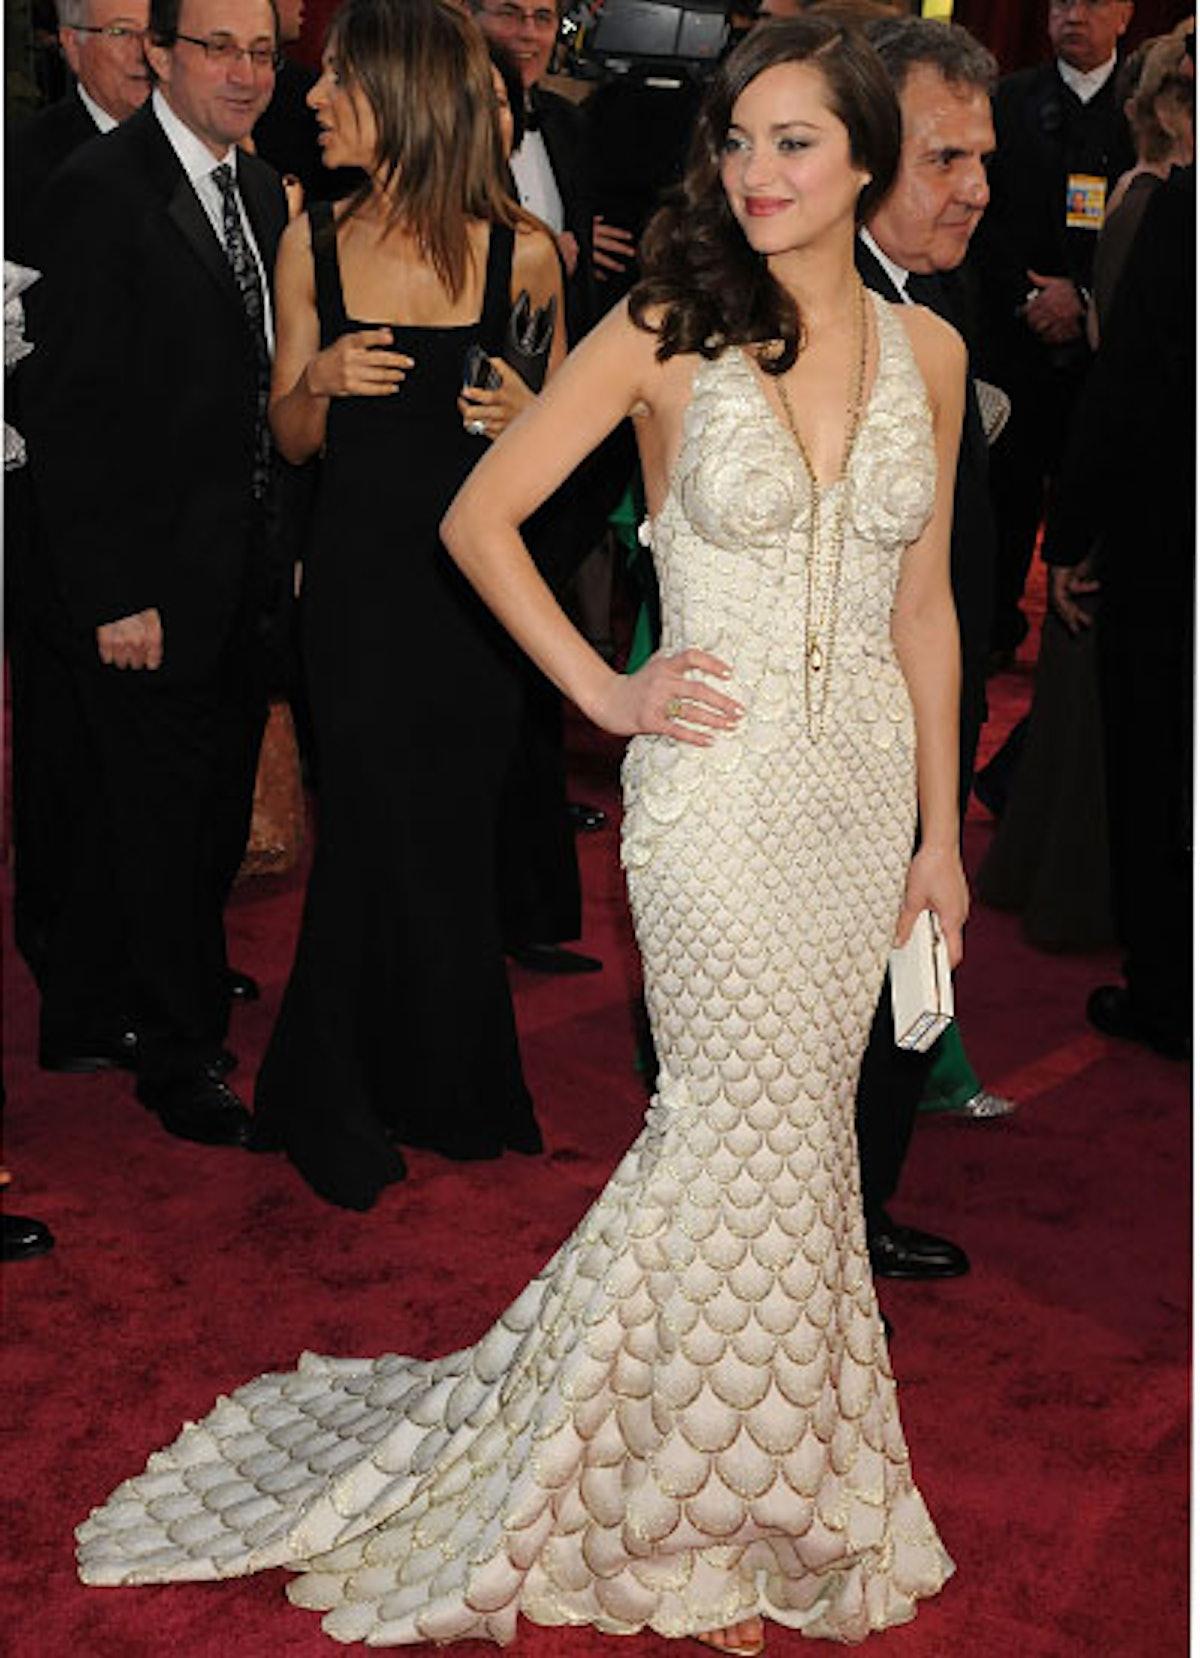 cess-marion-cotillard-best-red-carpet-looks-03-v.jpg